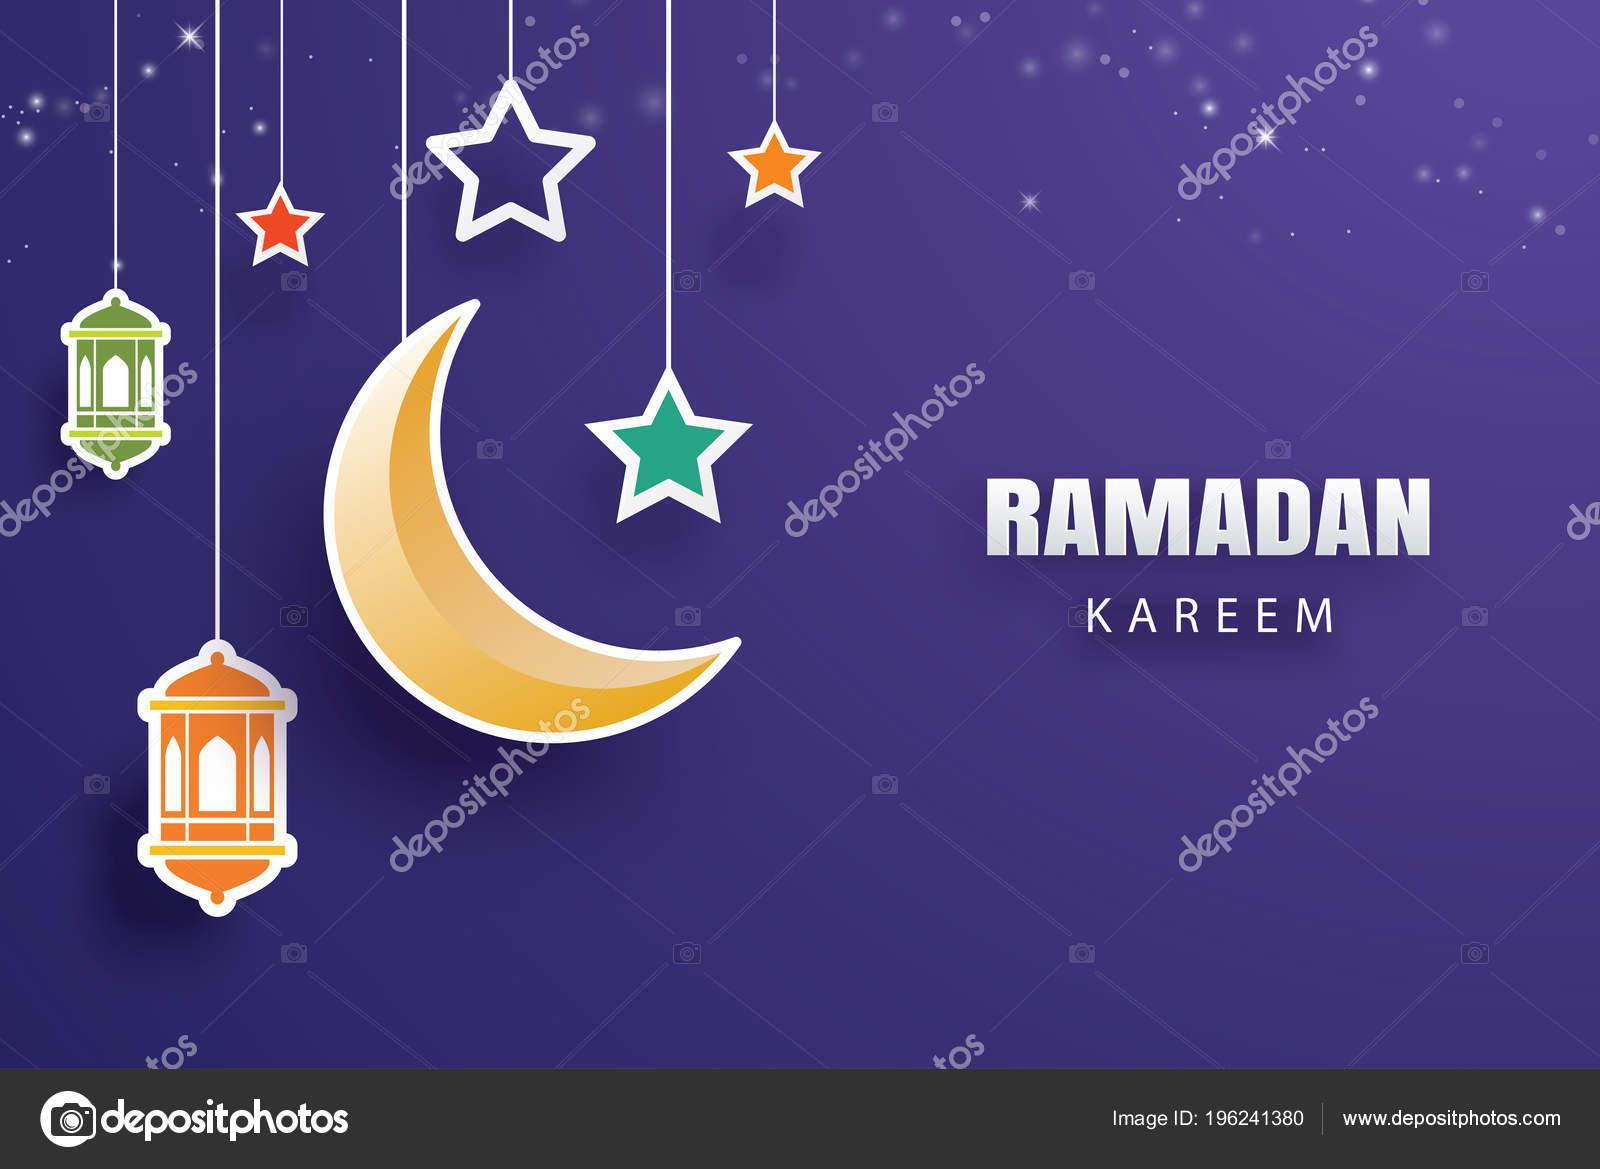 Ramadan kareem greeting card moon stars traditional lanterns ramadan kareem greeting card moon stars traditional lanterns background eid stock vector m4hsunfo